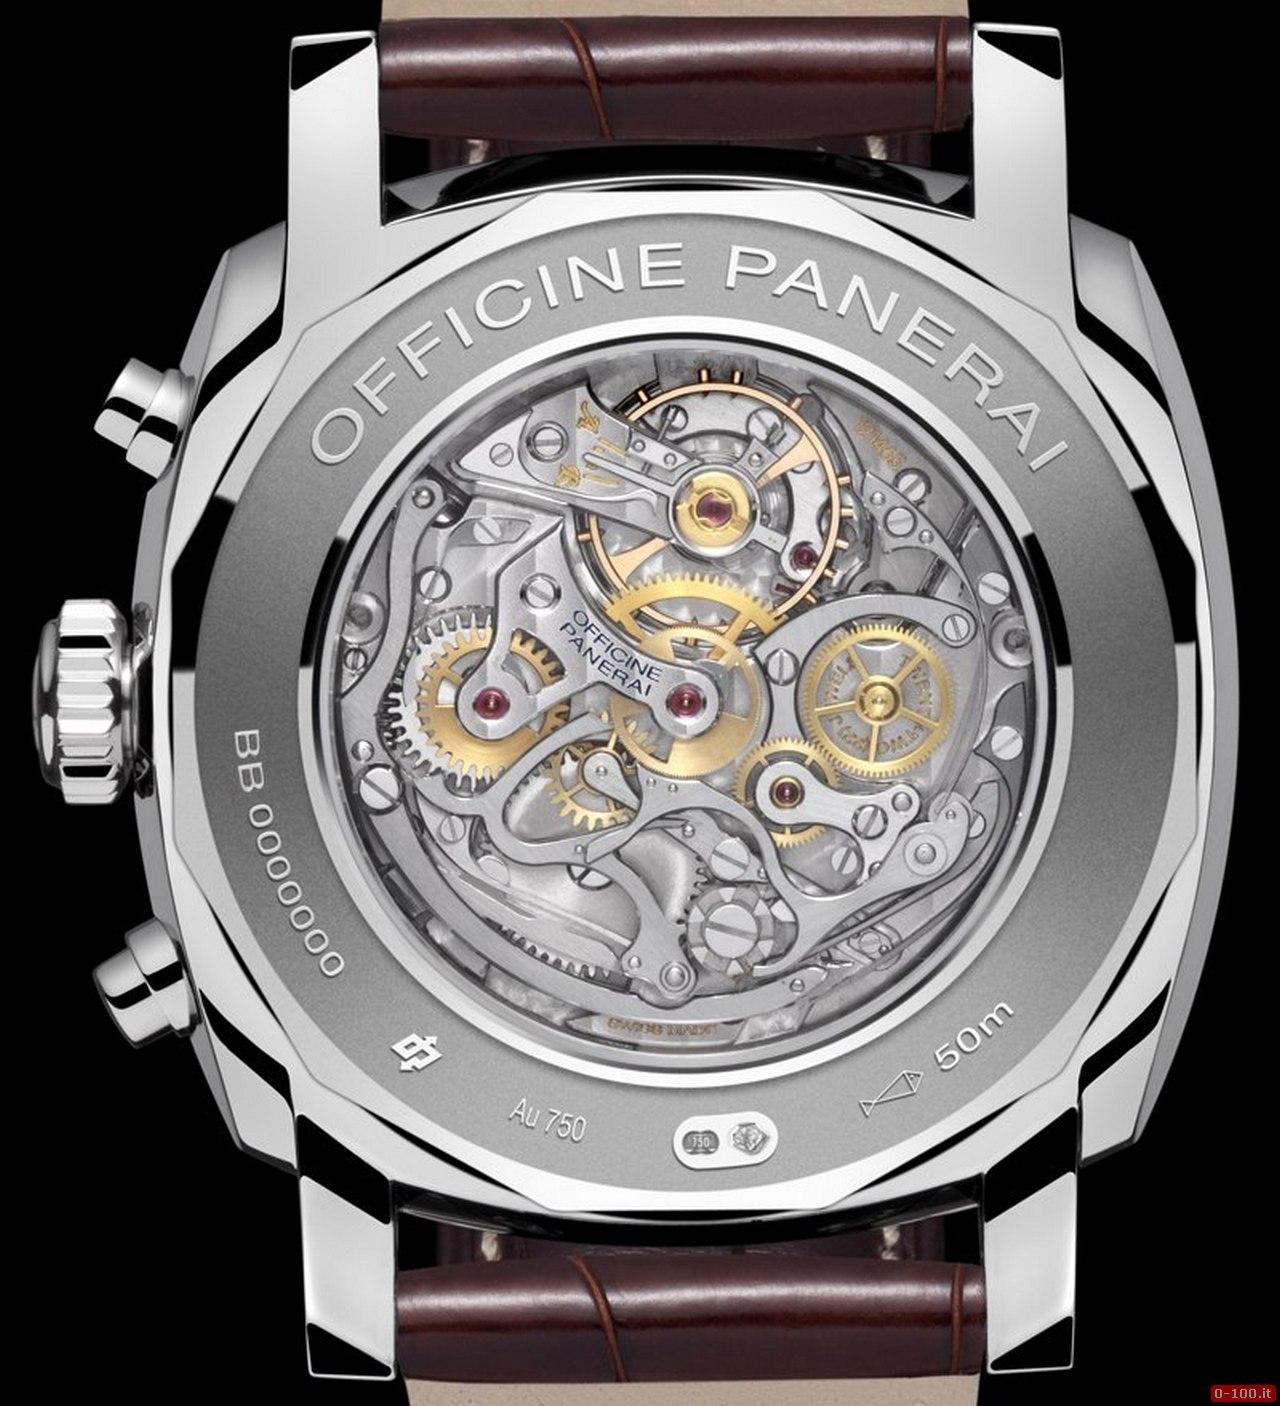 sihh-2014-panerai-radiomir-1940-chronograph-collection-limited-edition_0-100_15